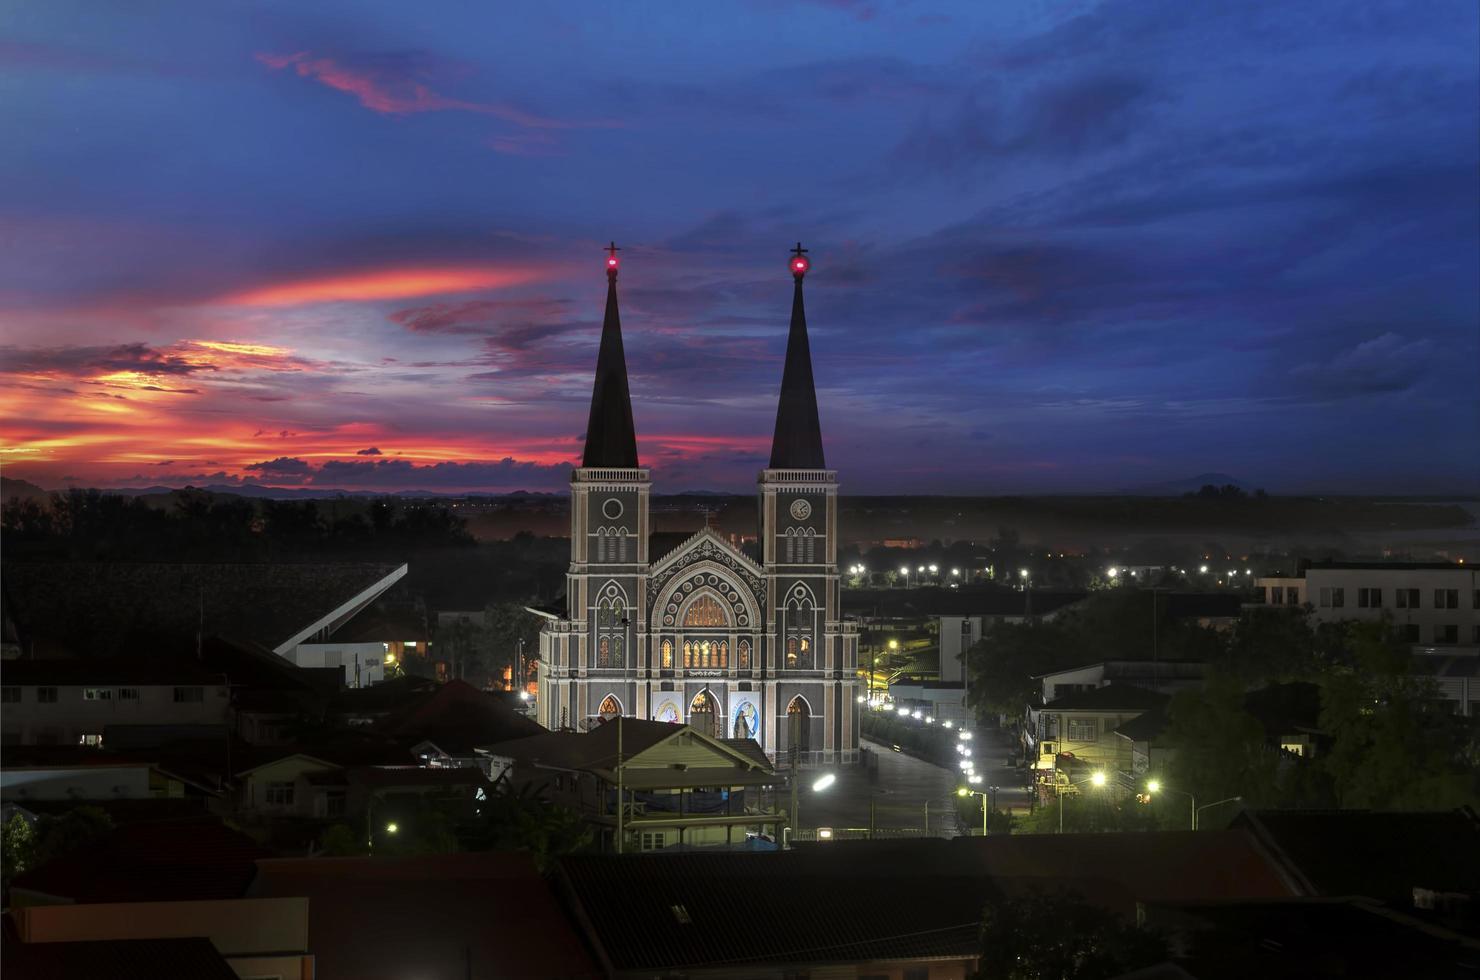 katholieke kerk in de provincie chantaburi, thailand foto